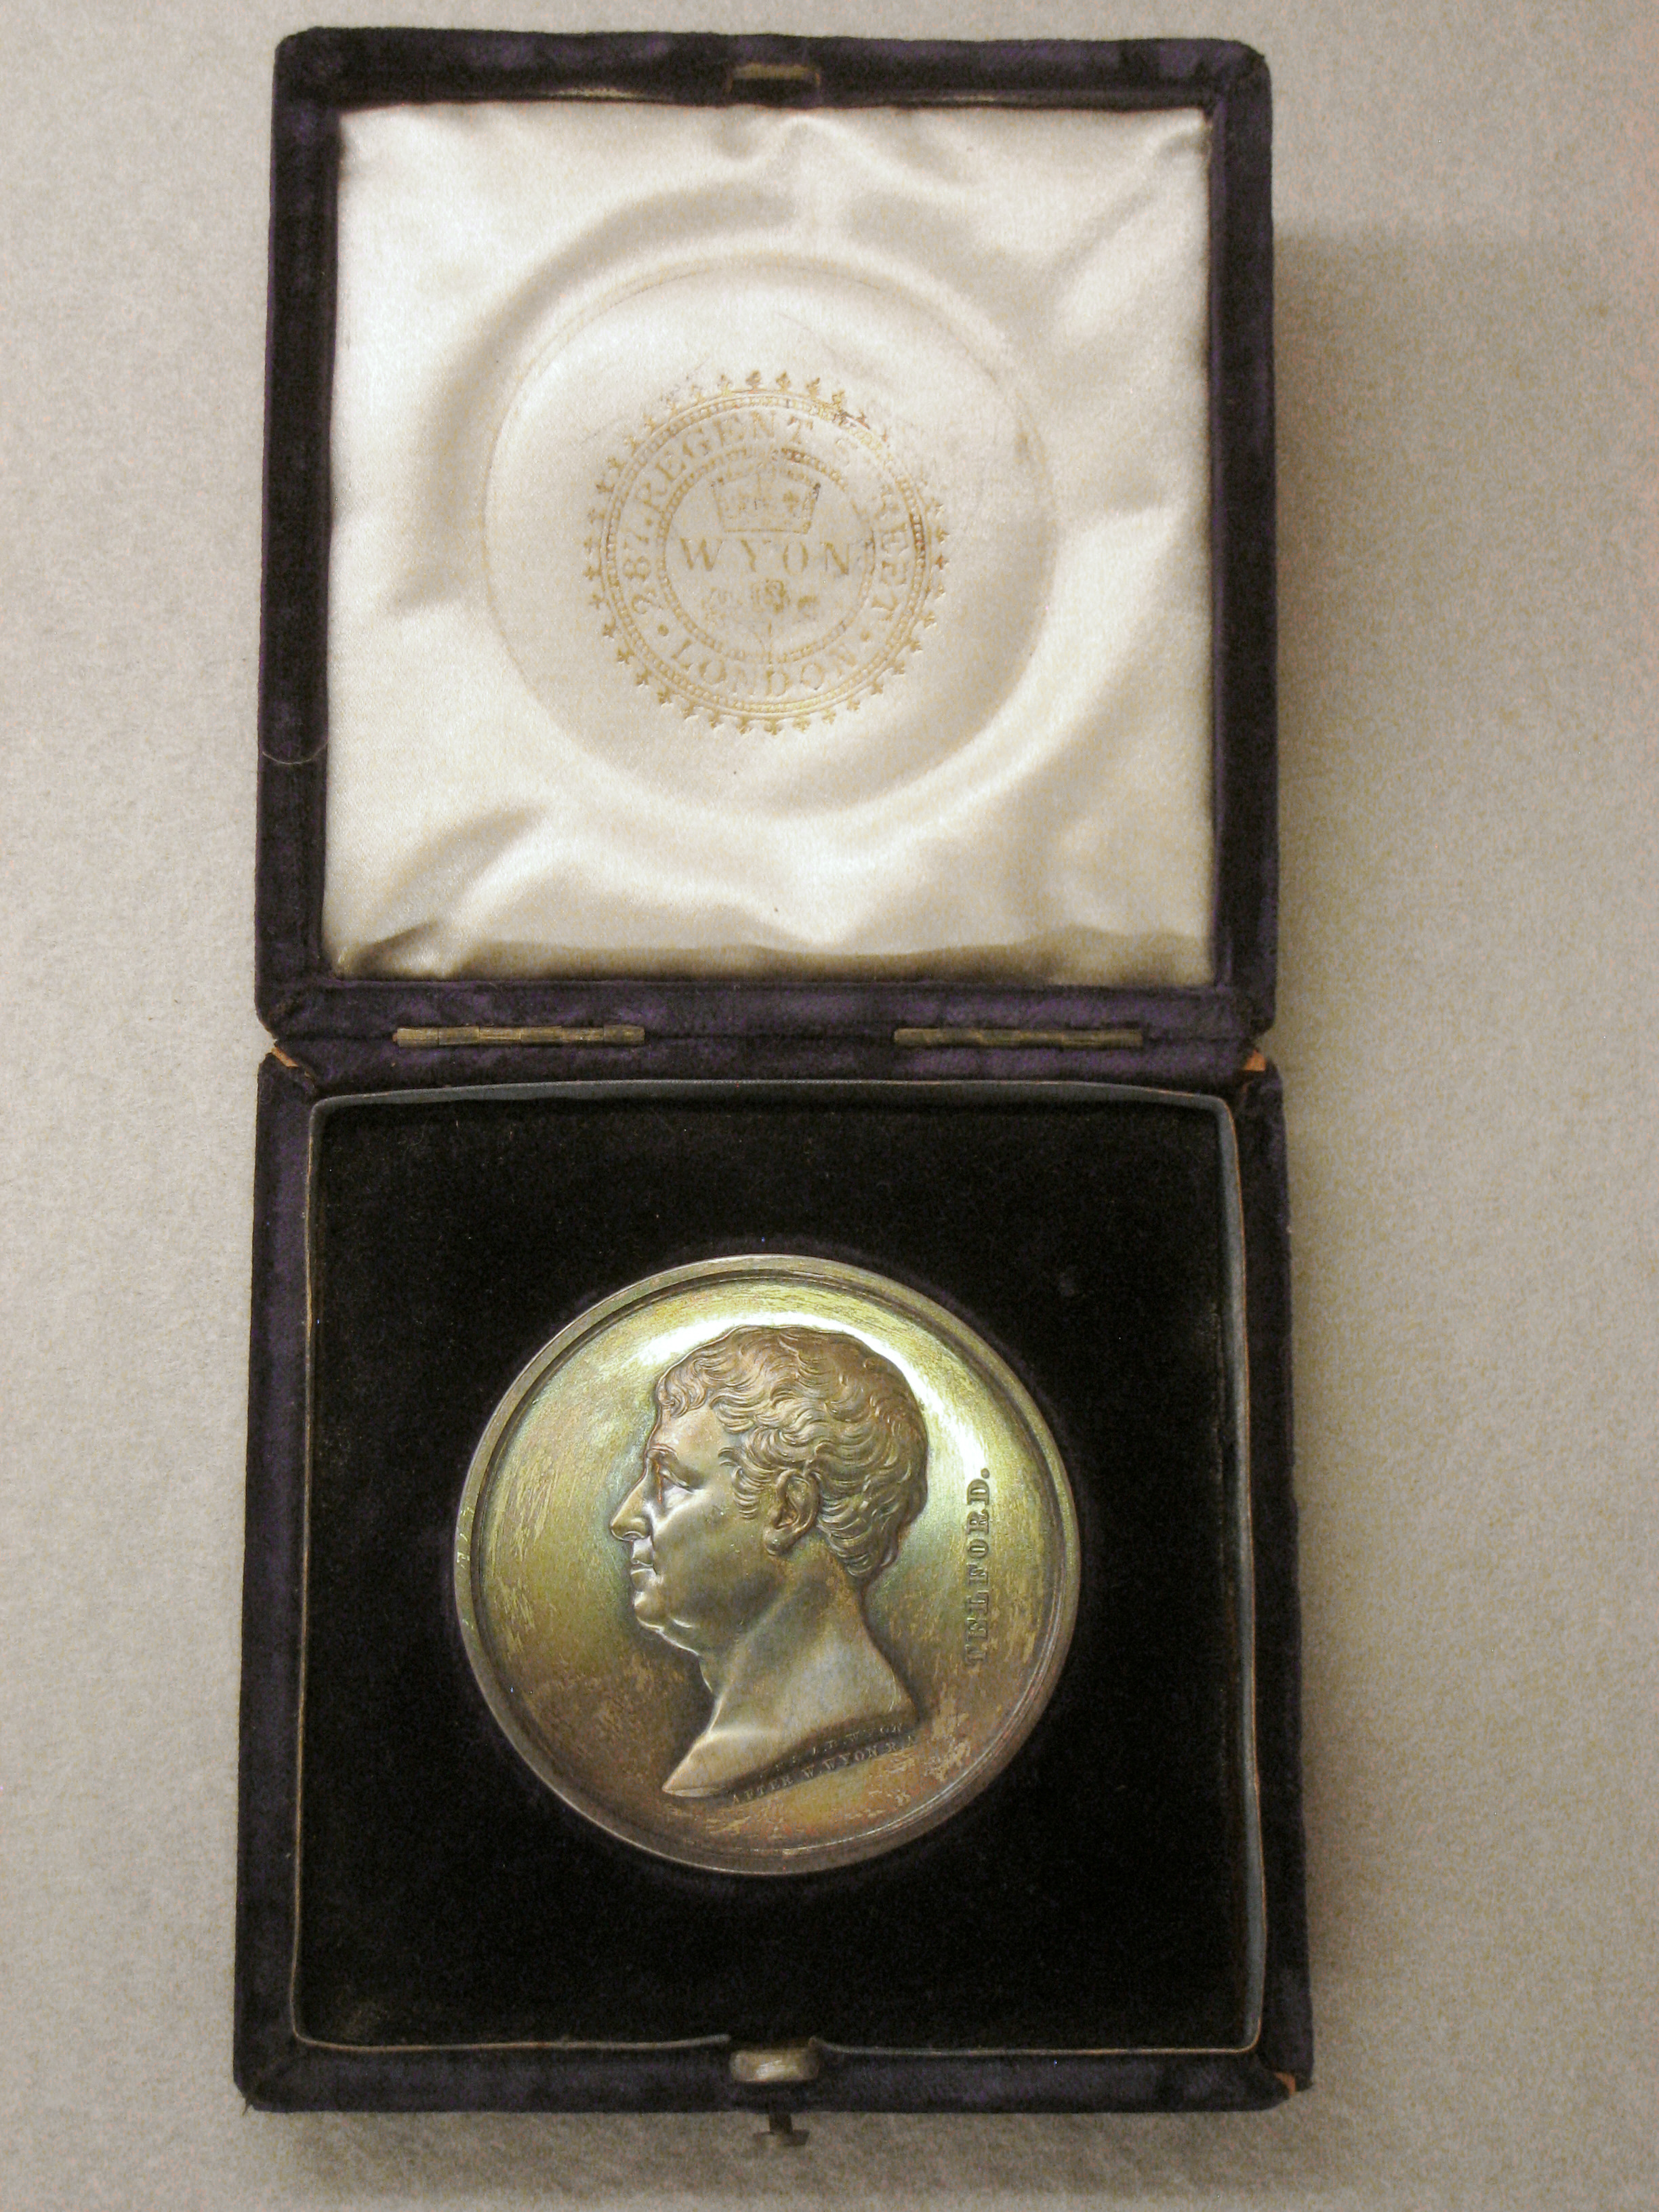 Telford Medal - Wikipedia